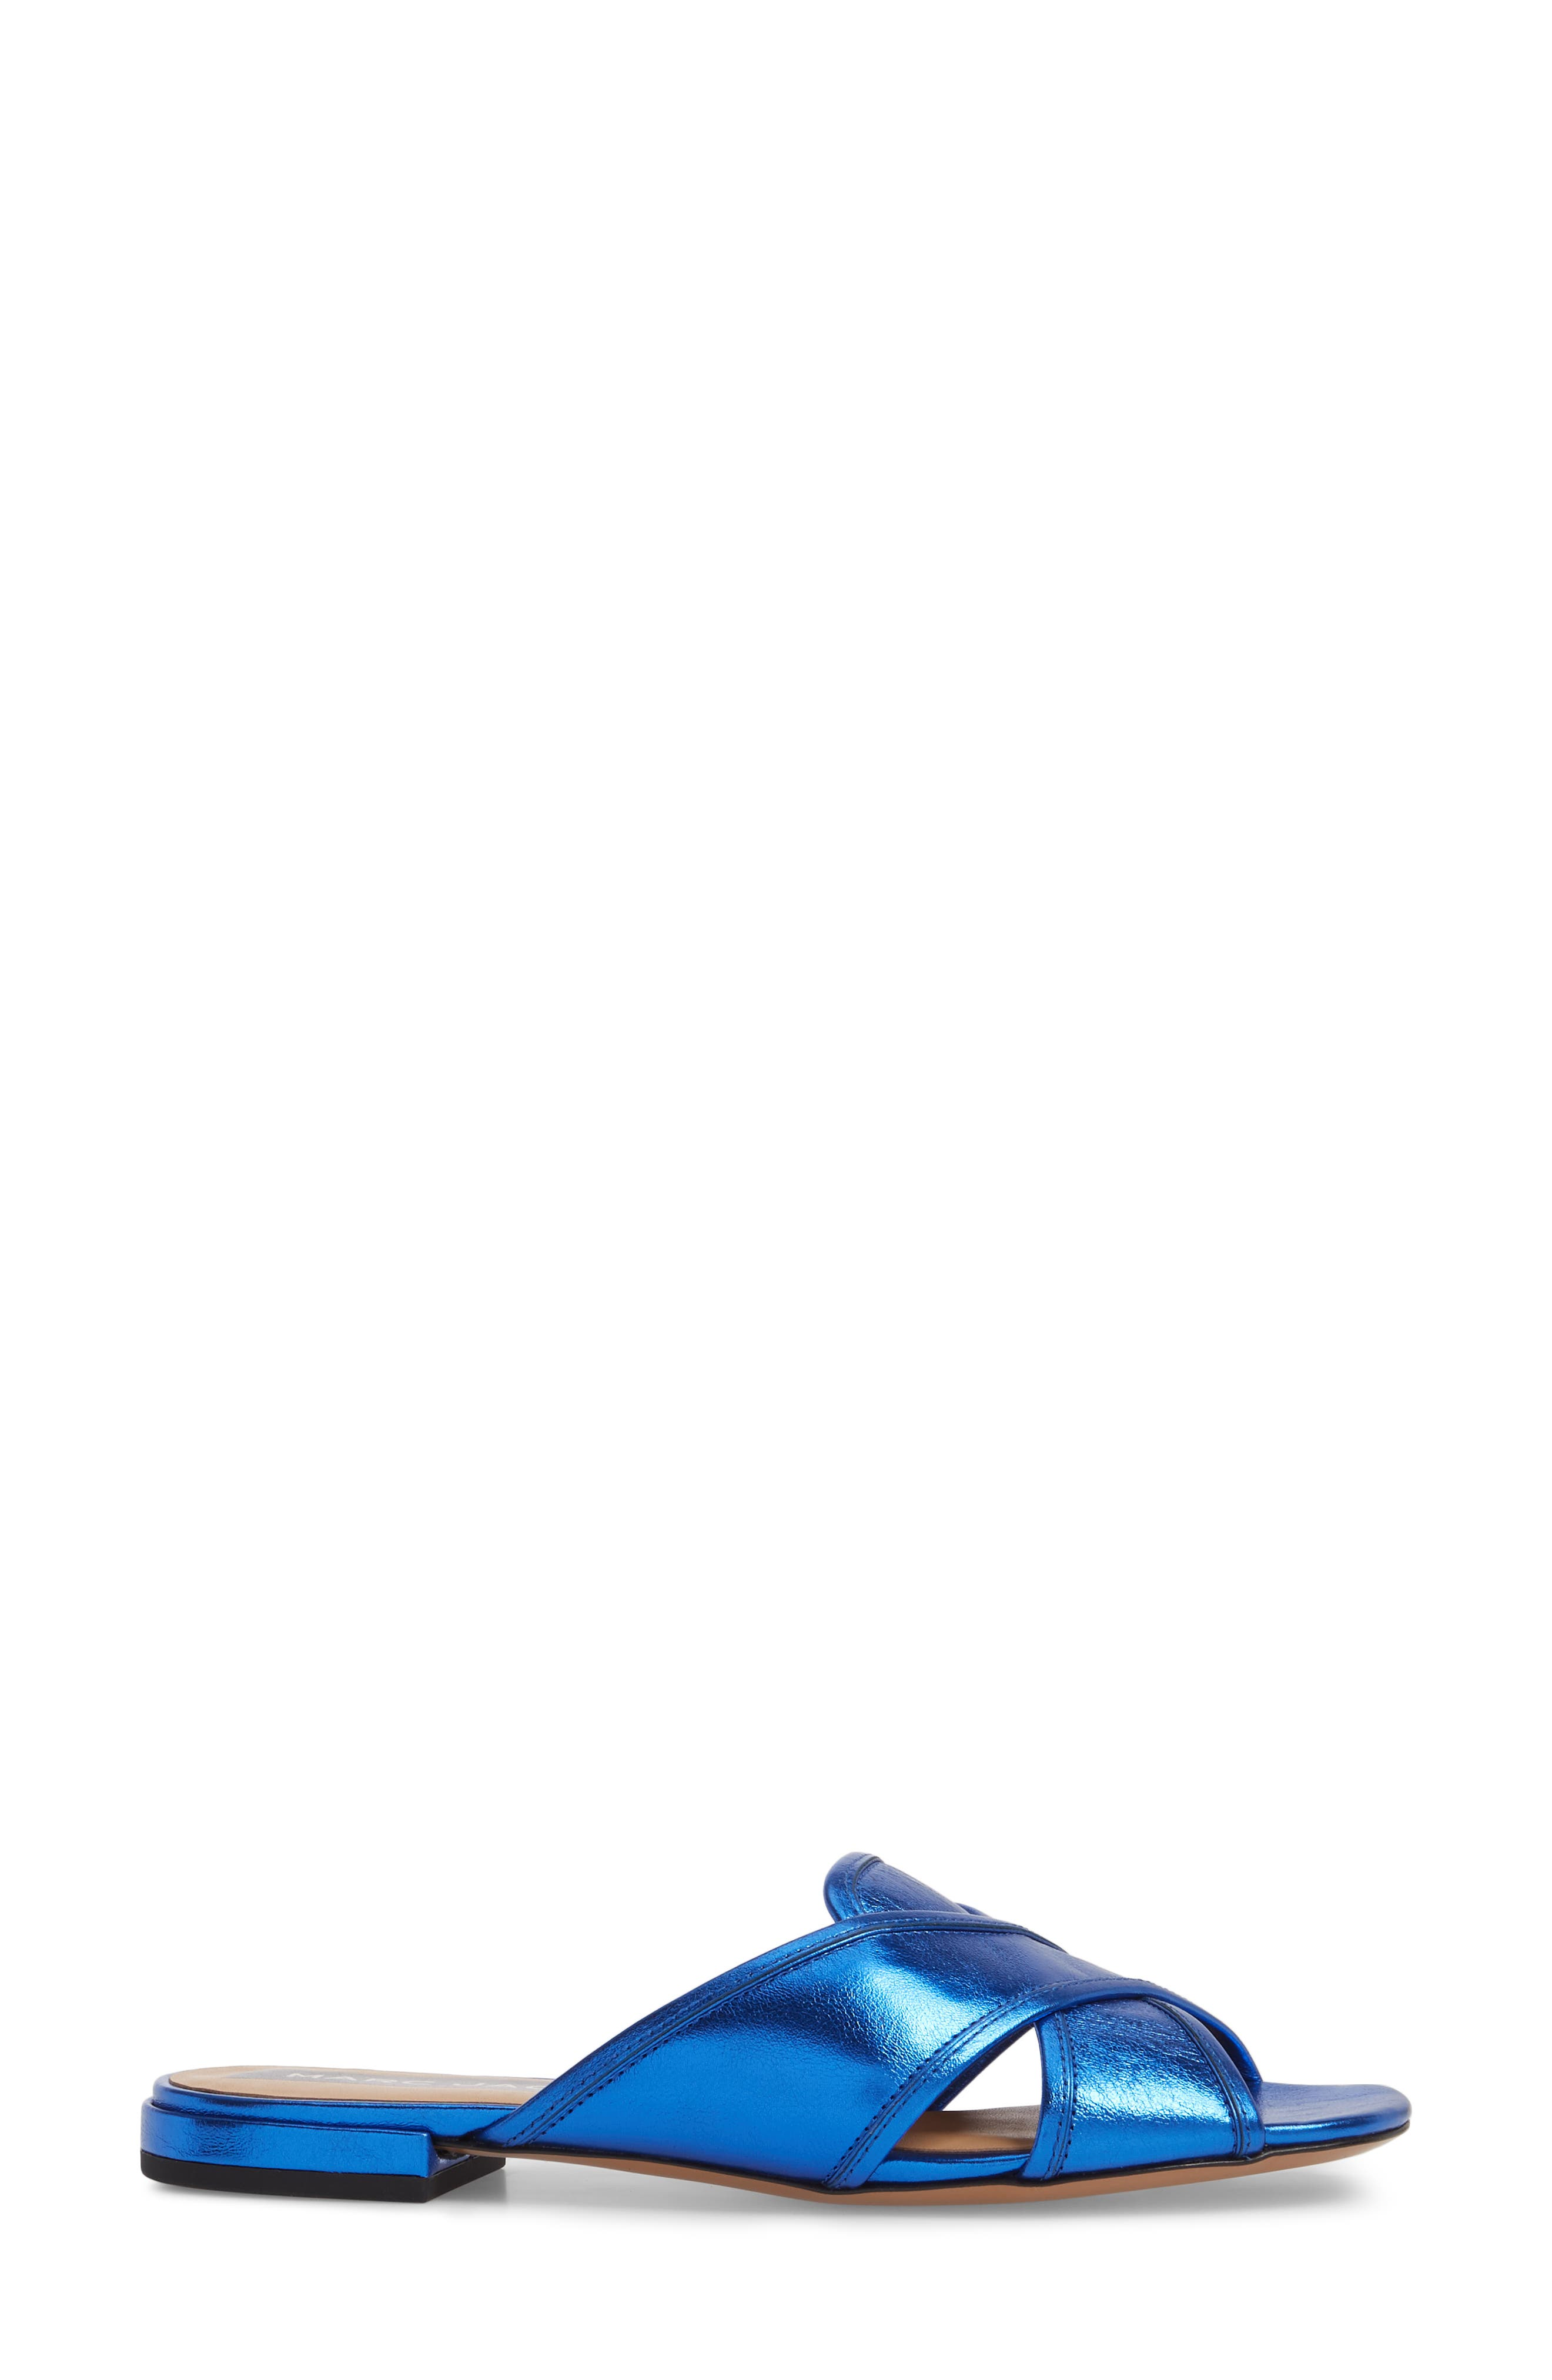 Aurora Metallic Slide Sandal,                             Alternate thumbnail 3, color,                             BLUE